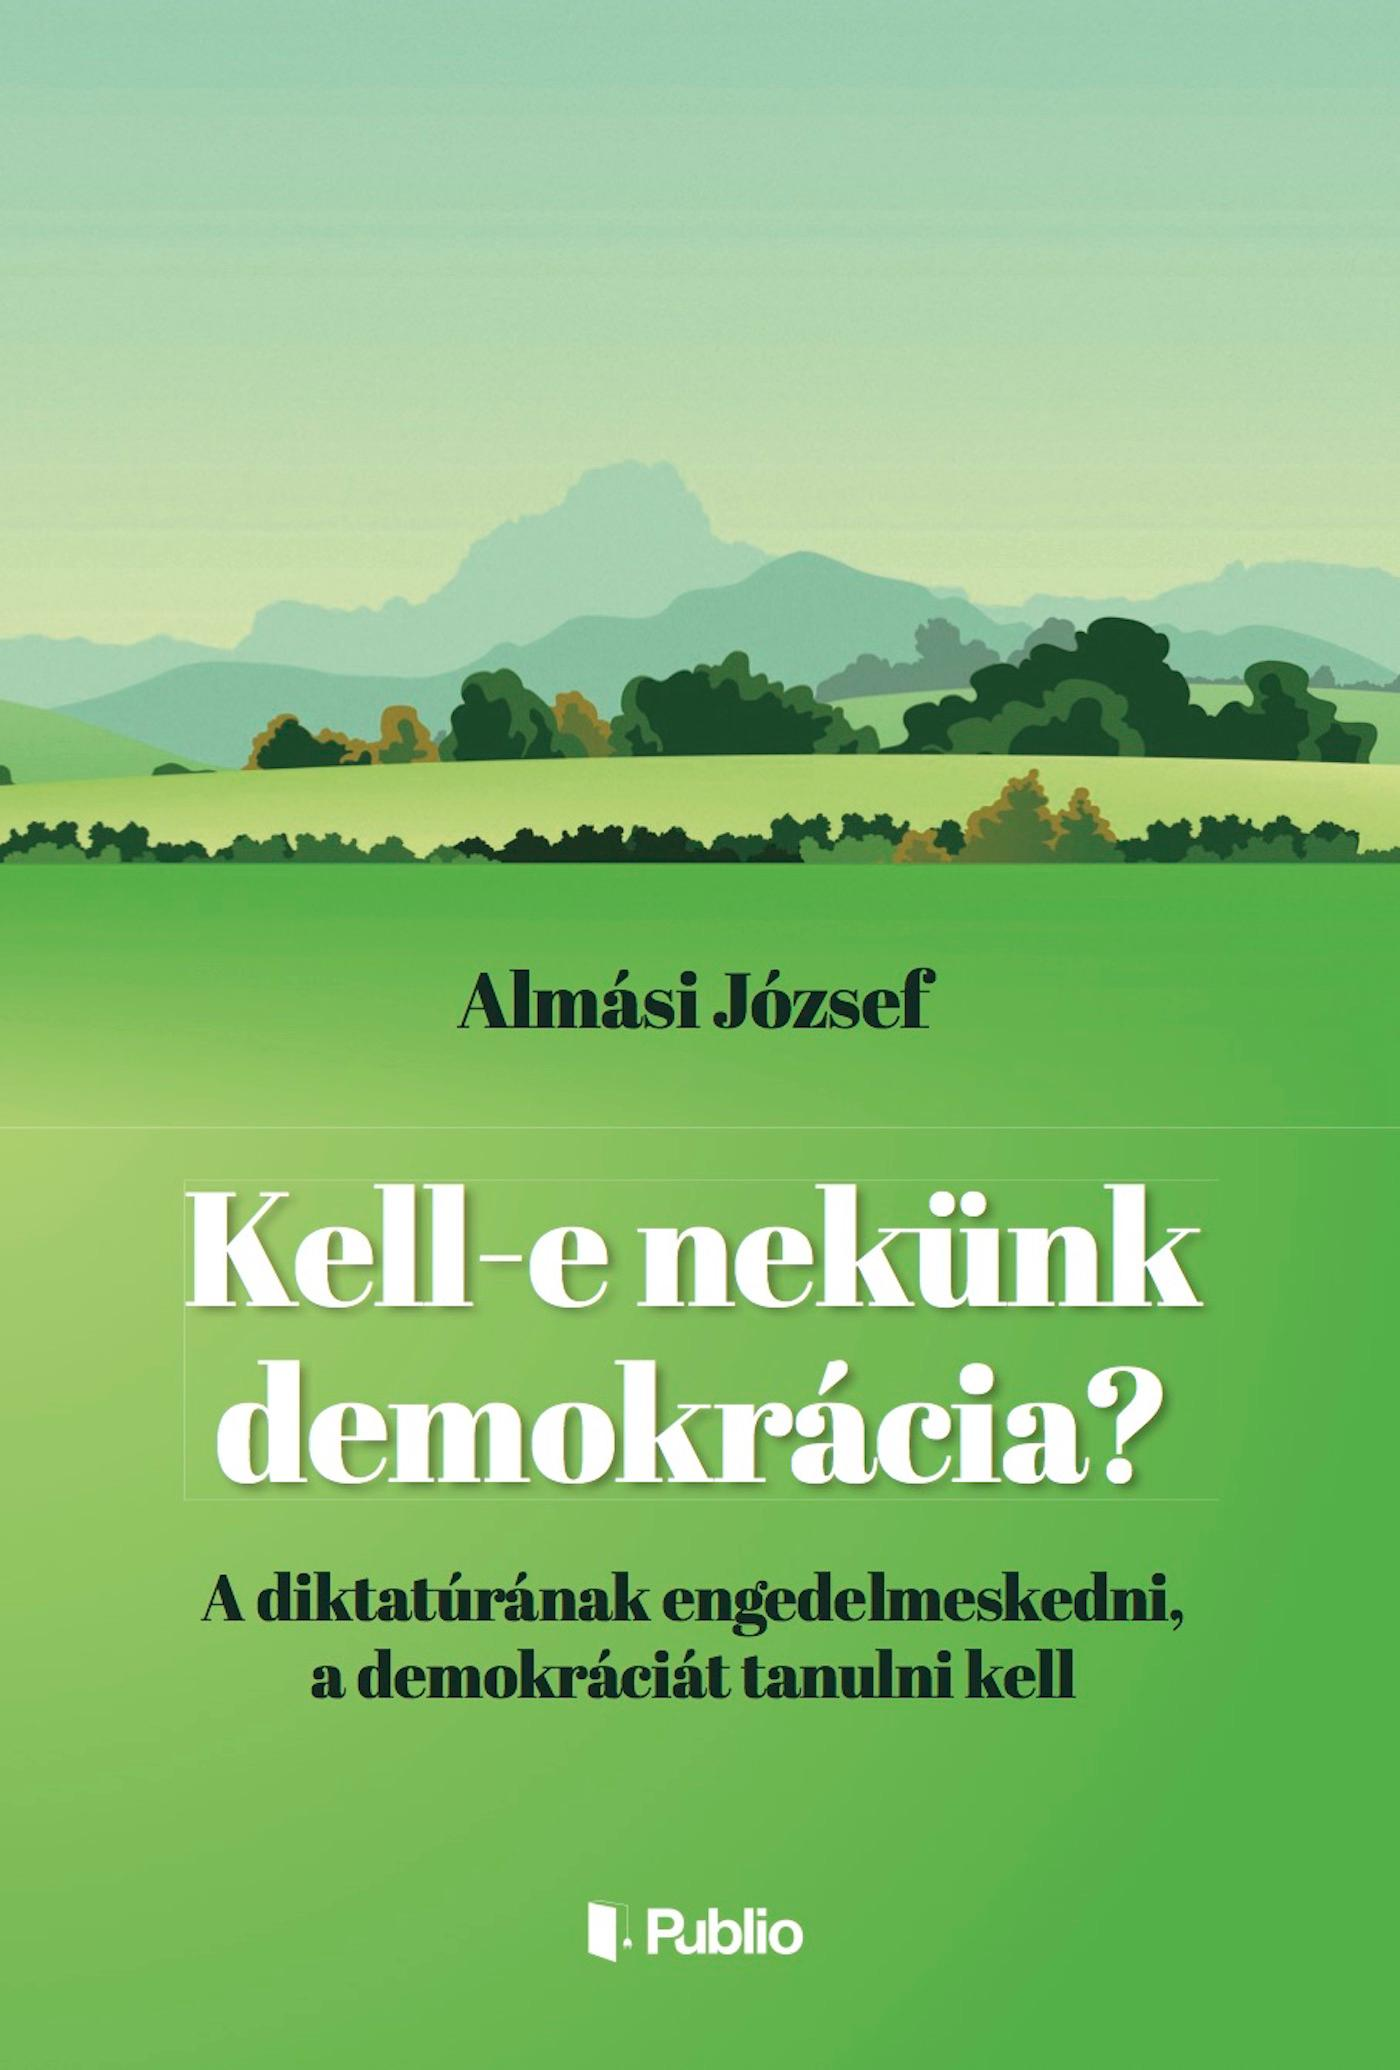 KELL- E NEKÜNK DEMOKRÁCIA?